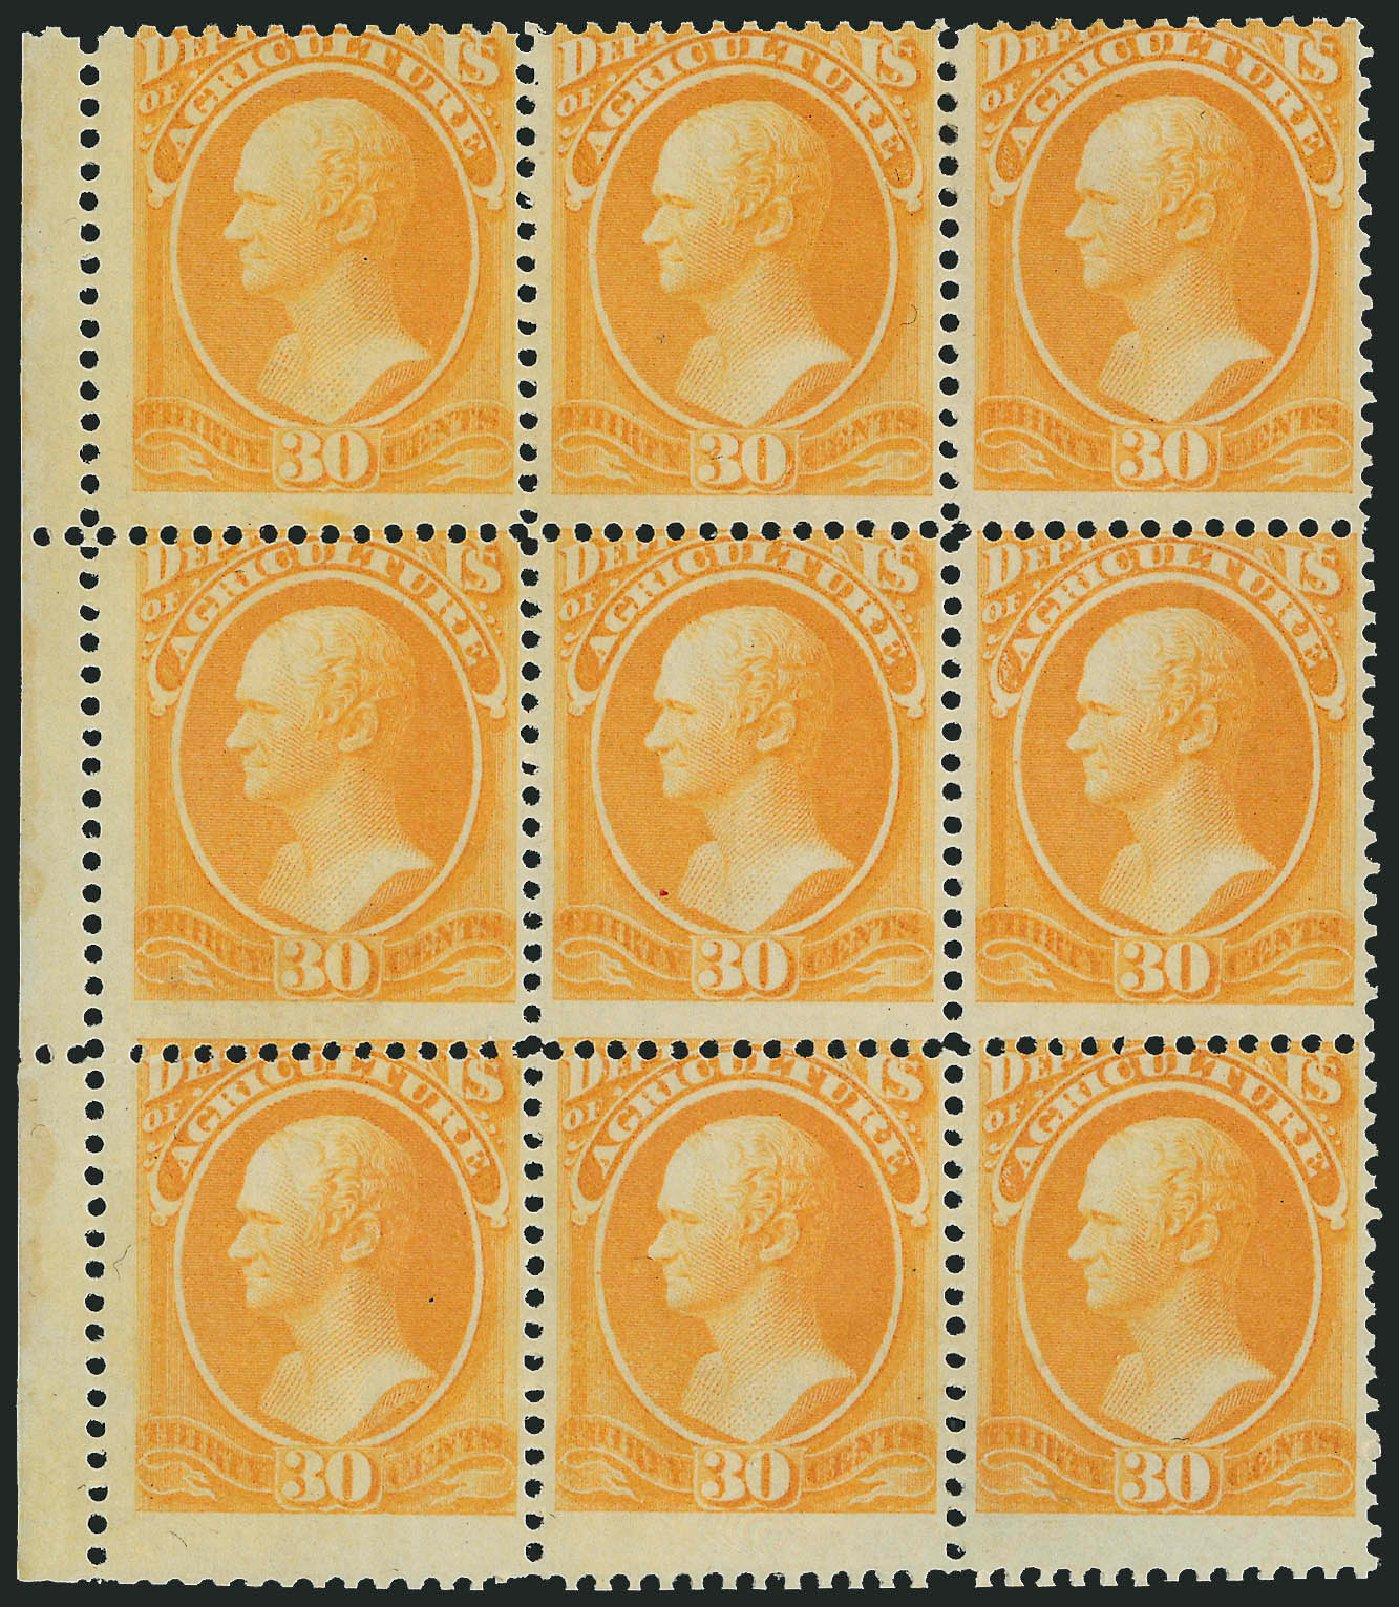 Value of US Stamp Scott Catalog O9: 1873 30c Agriculture Official. Robert Siegel Auction Galleries, Nov 2014, Sale 1085, Lot 4018